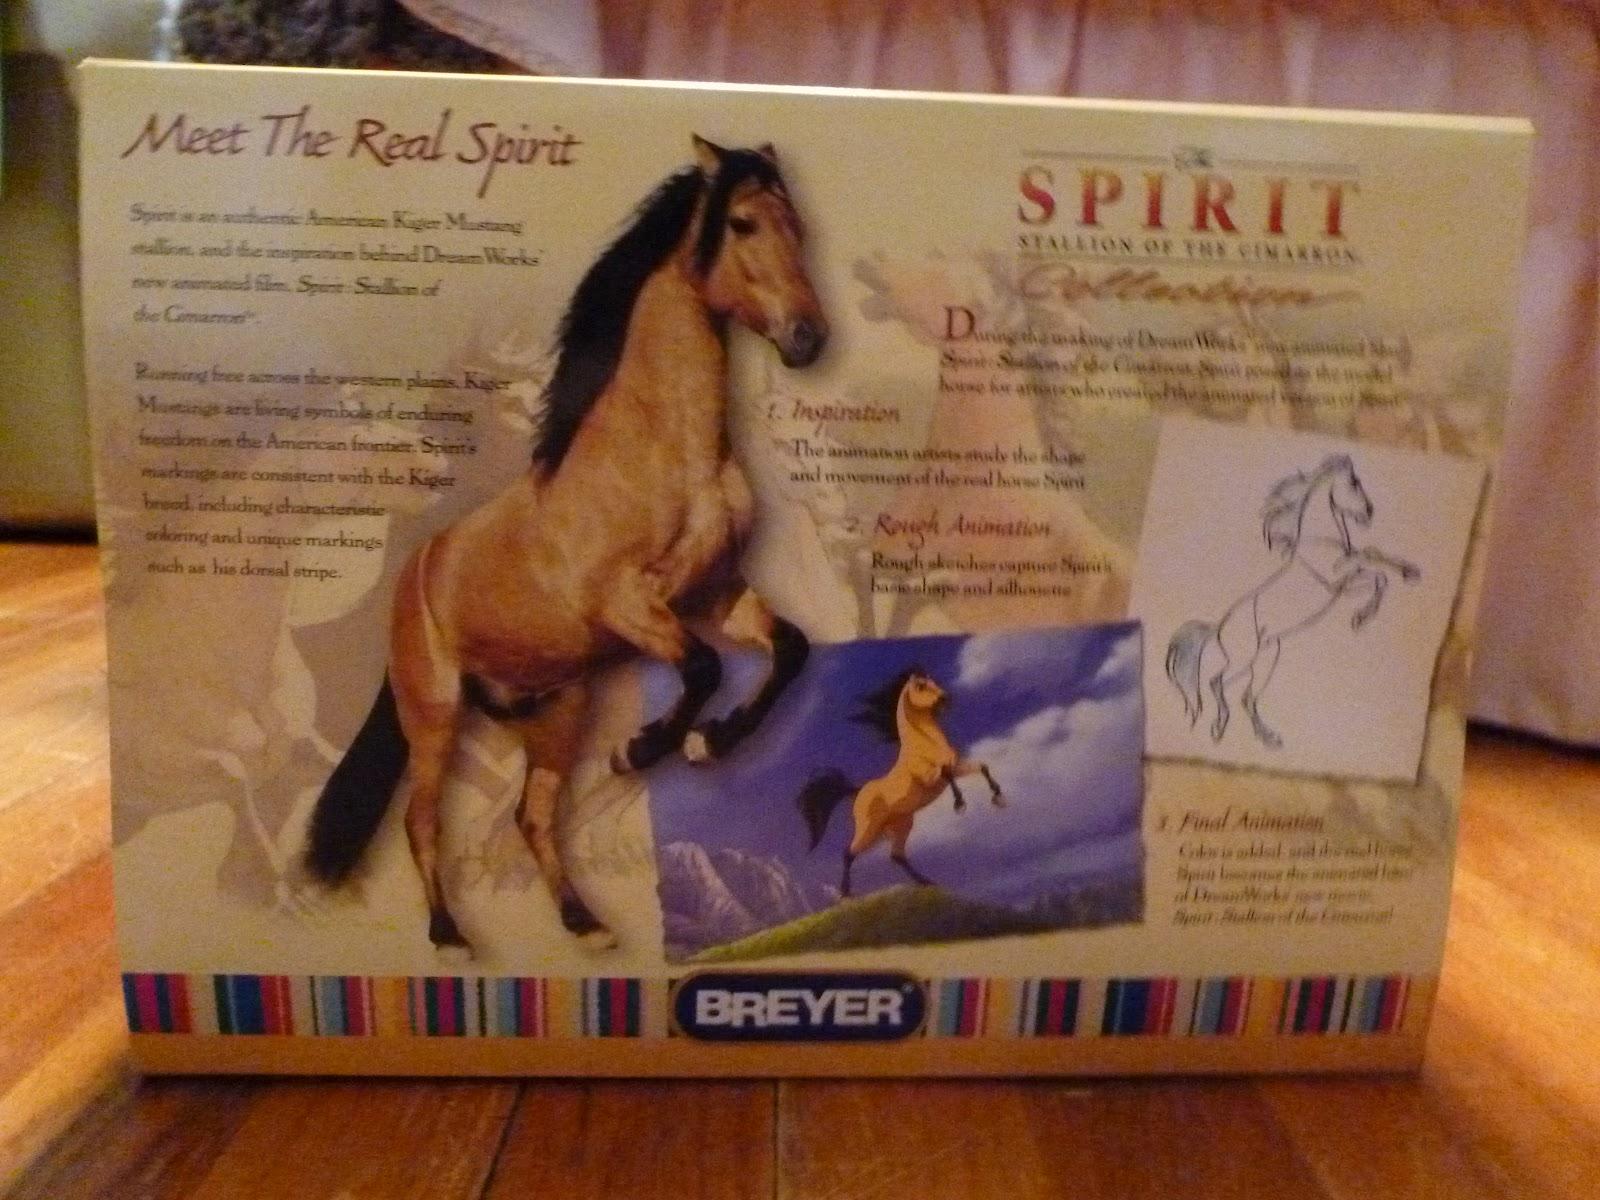 Most Inspiring   Wallpaper Horse Spirit - Breyers+014  Graphic_997430.JPG